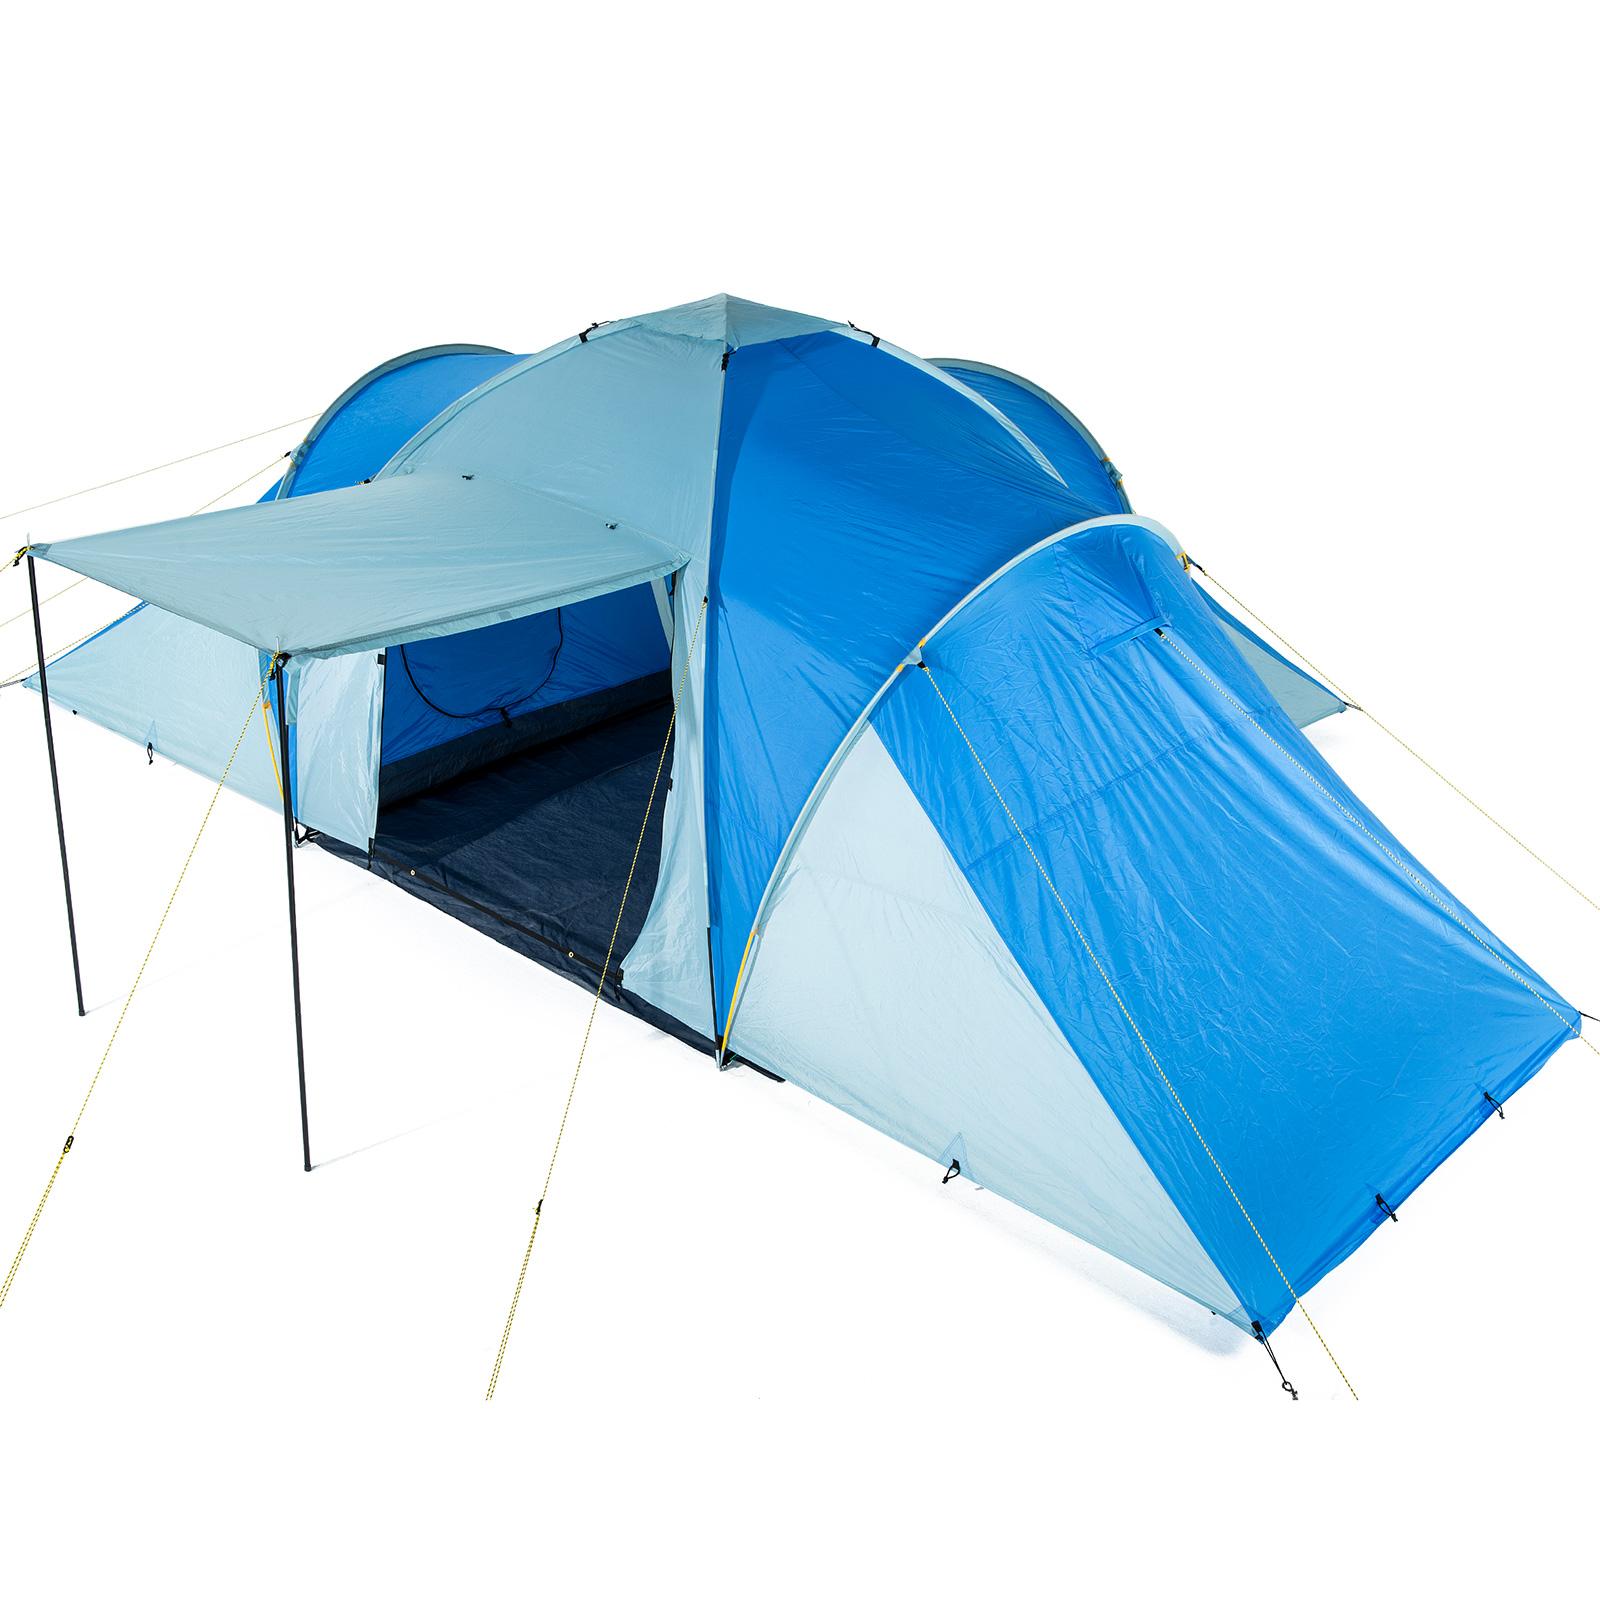 Muebles de camping de segunda mano sharemedoc - Segunda mano camping ...